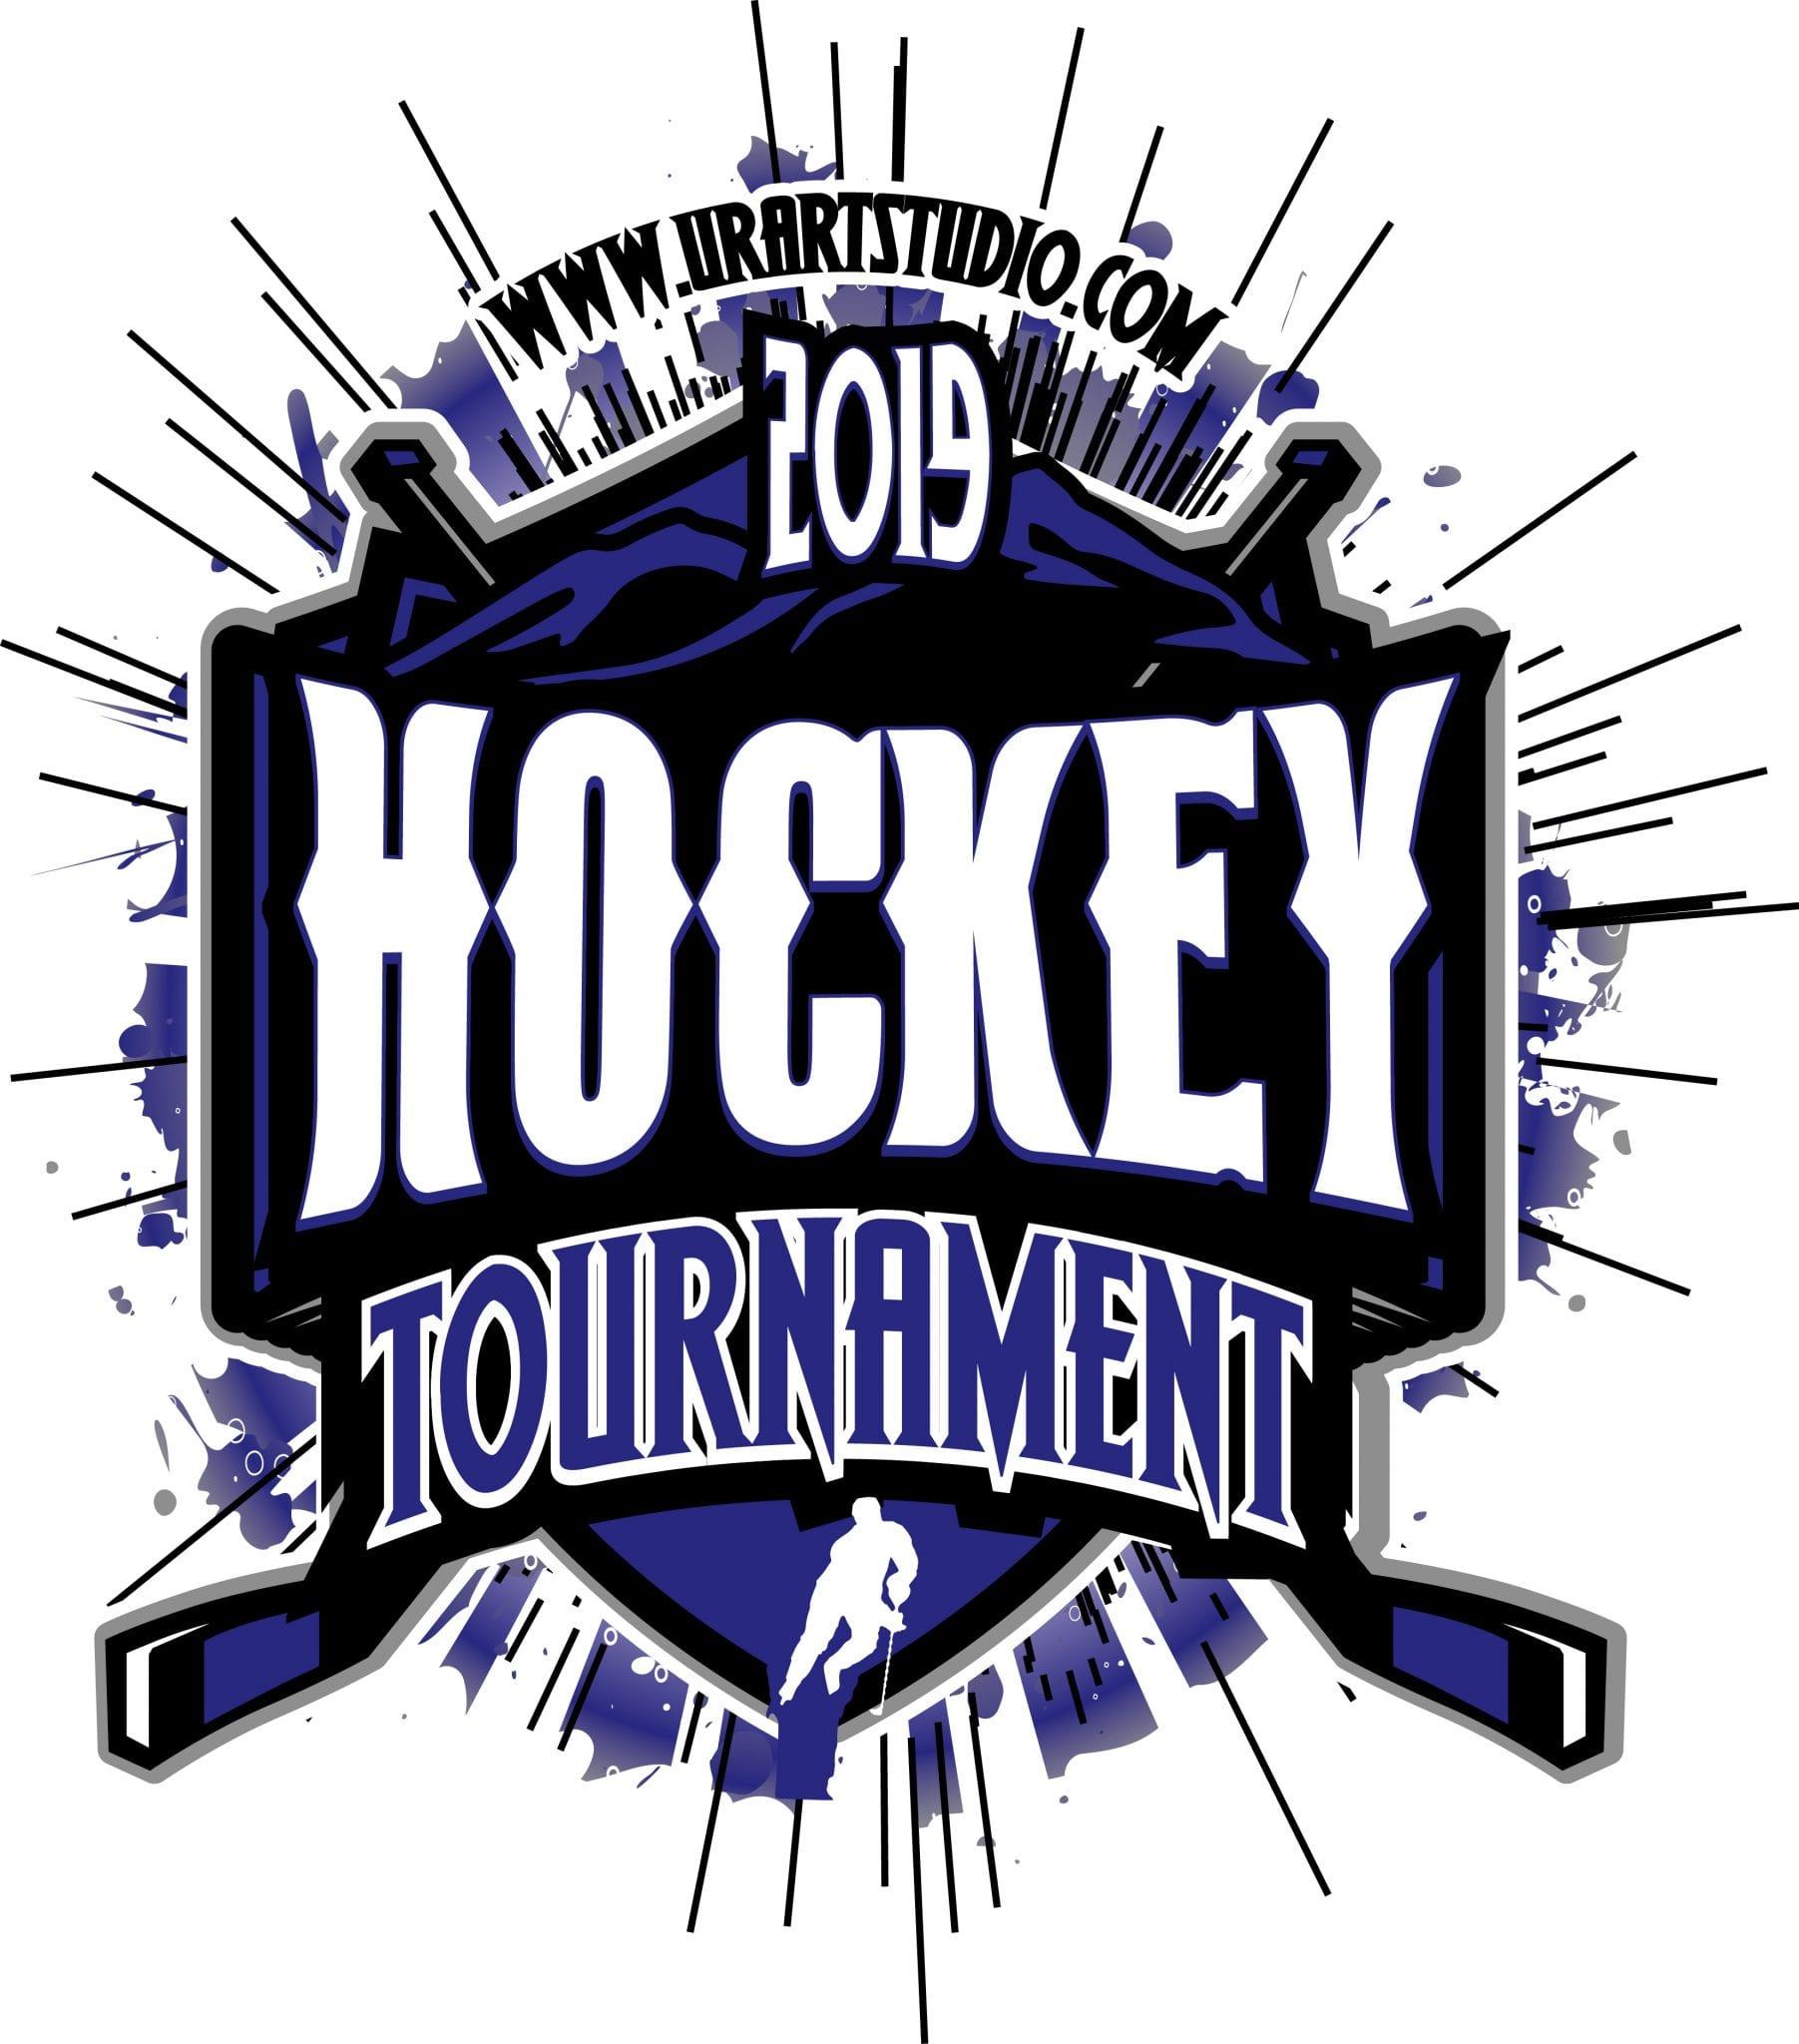 Hockey Tournament 2019 T Shirt Vector Logo Design For Print